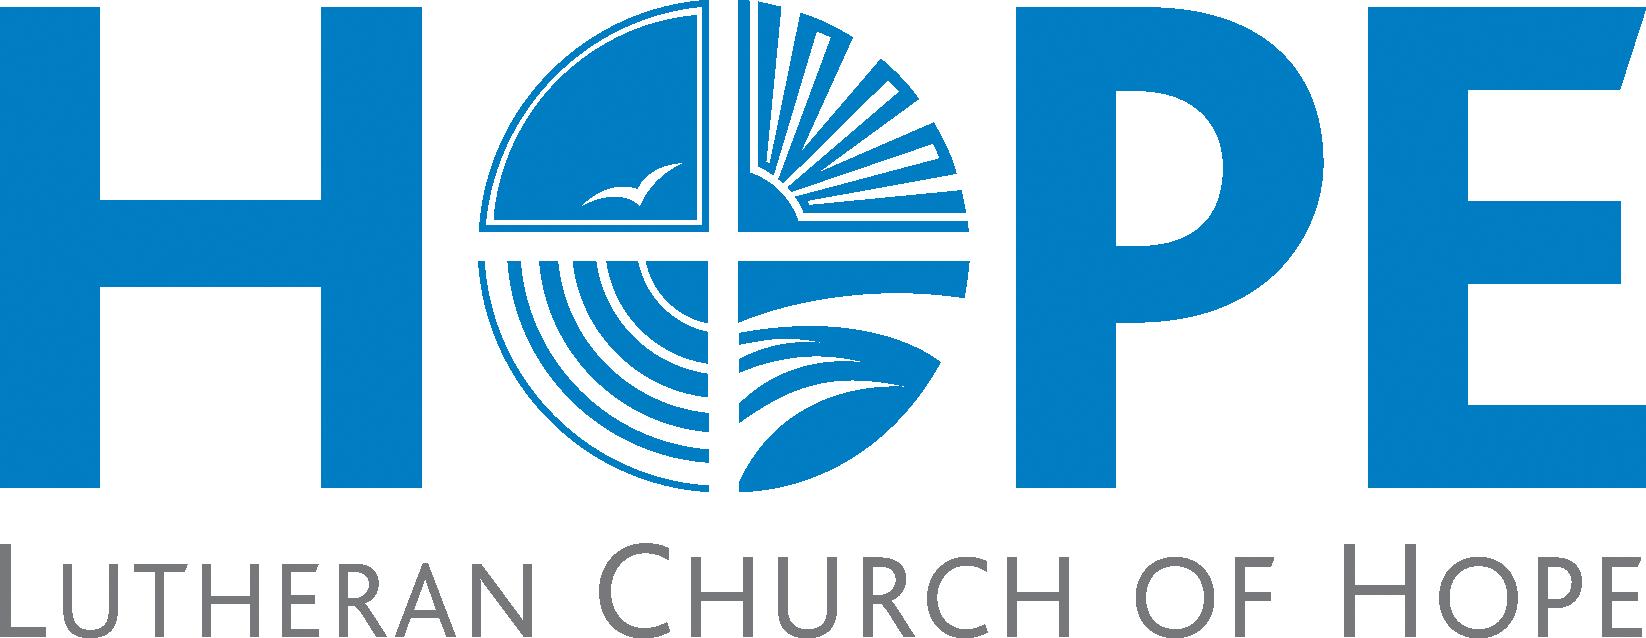 lutheran-church-of-hope-sponsor-logo-impact-iowa-honoring-americas-heroes